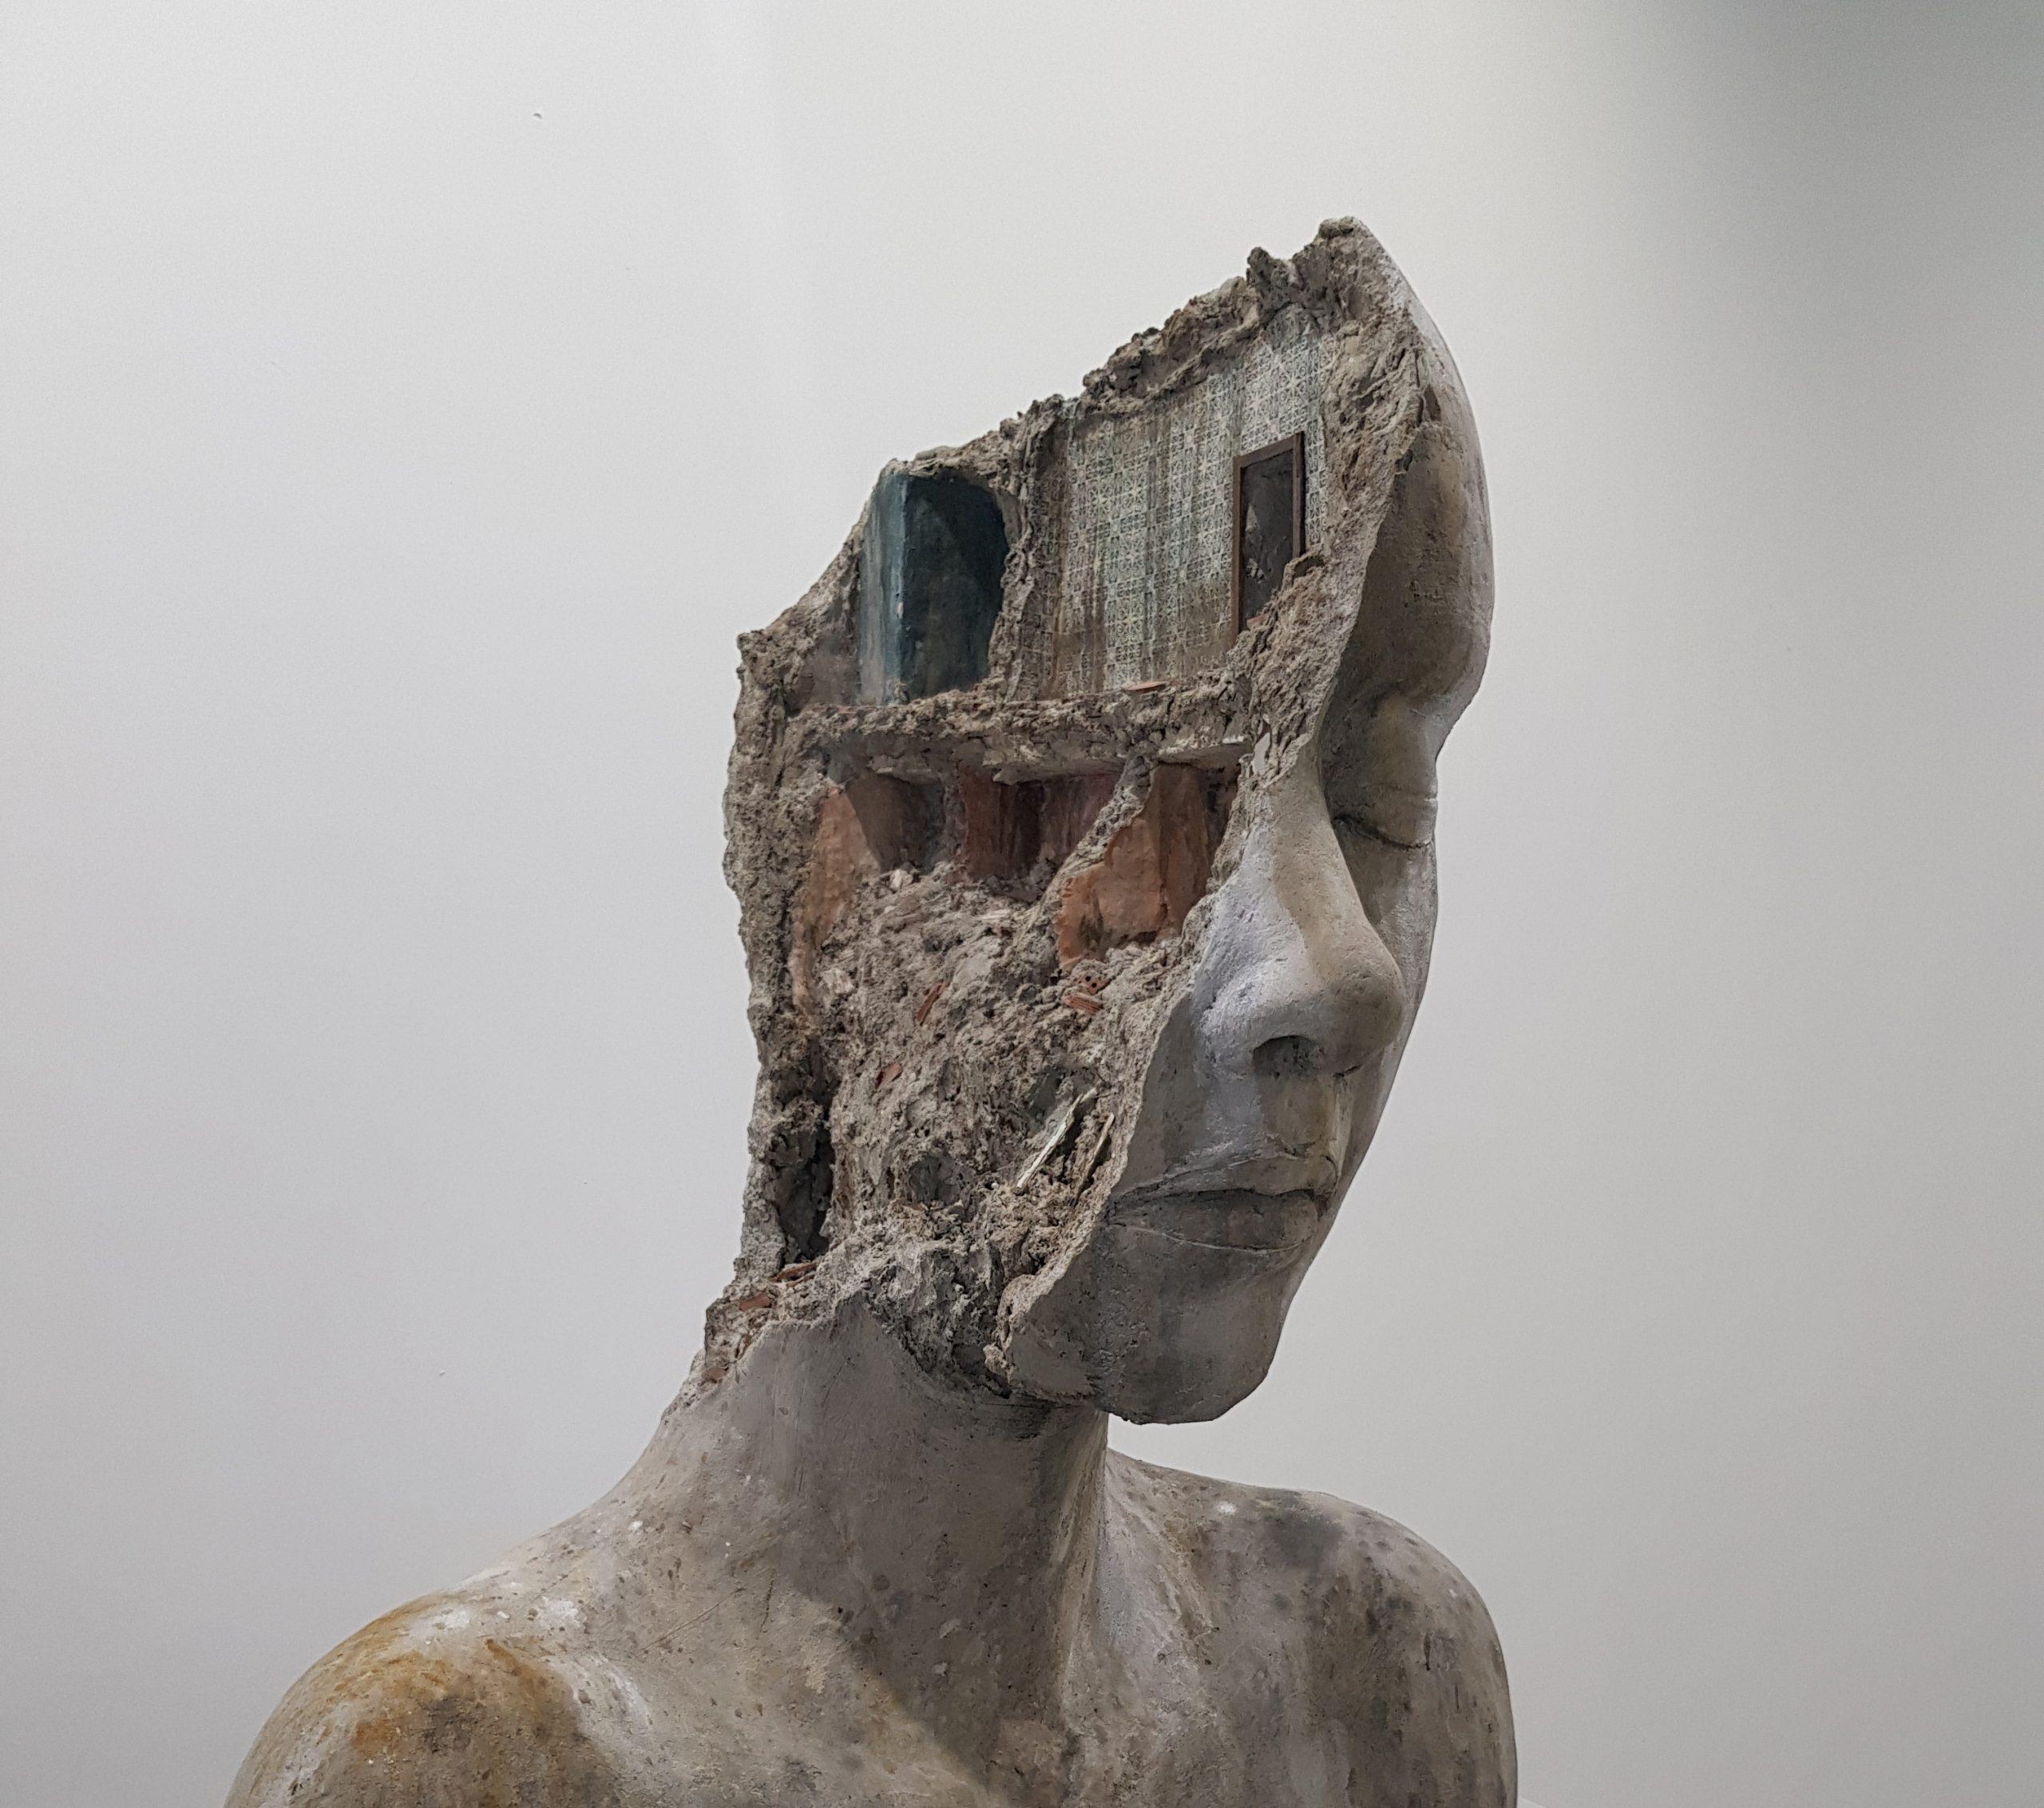 A photo of the sculpture En decontruccio 1 by artist Tania Font @Vegap / Kuvasto 2021